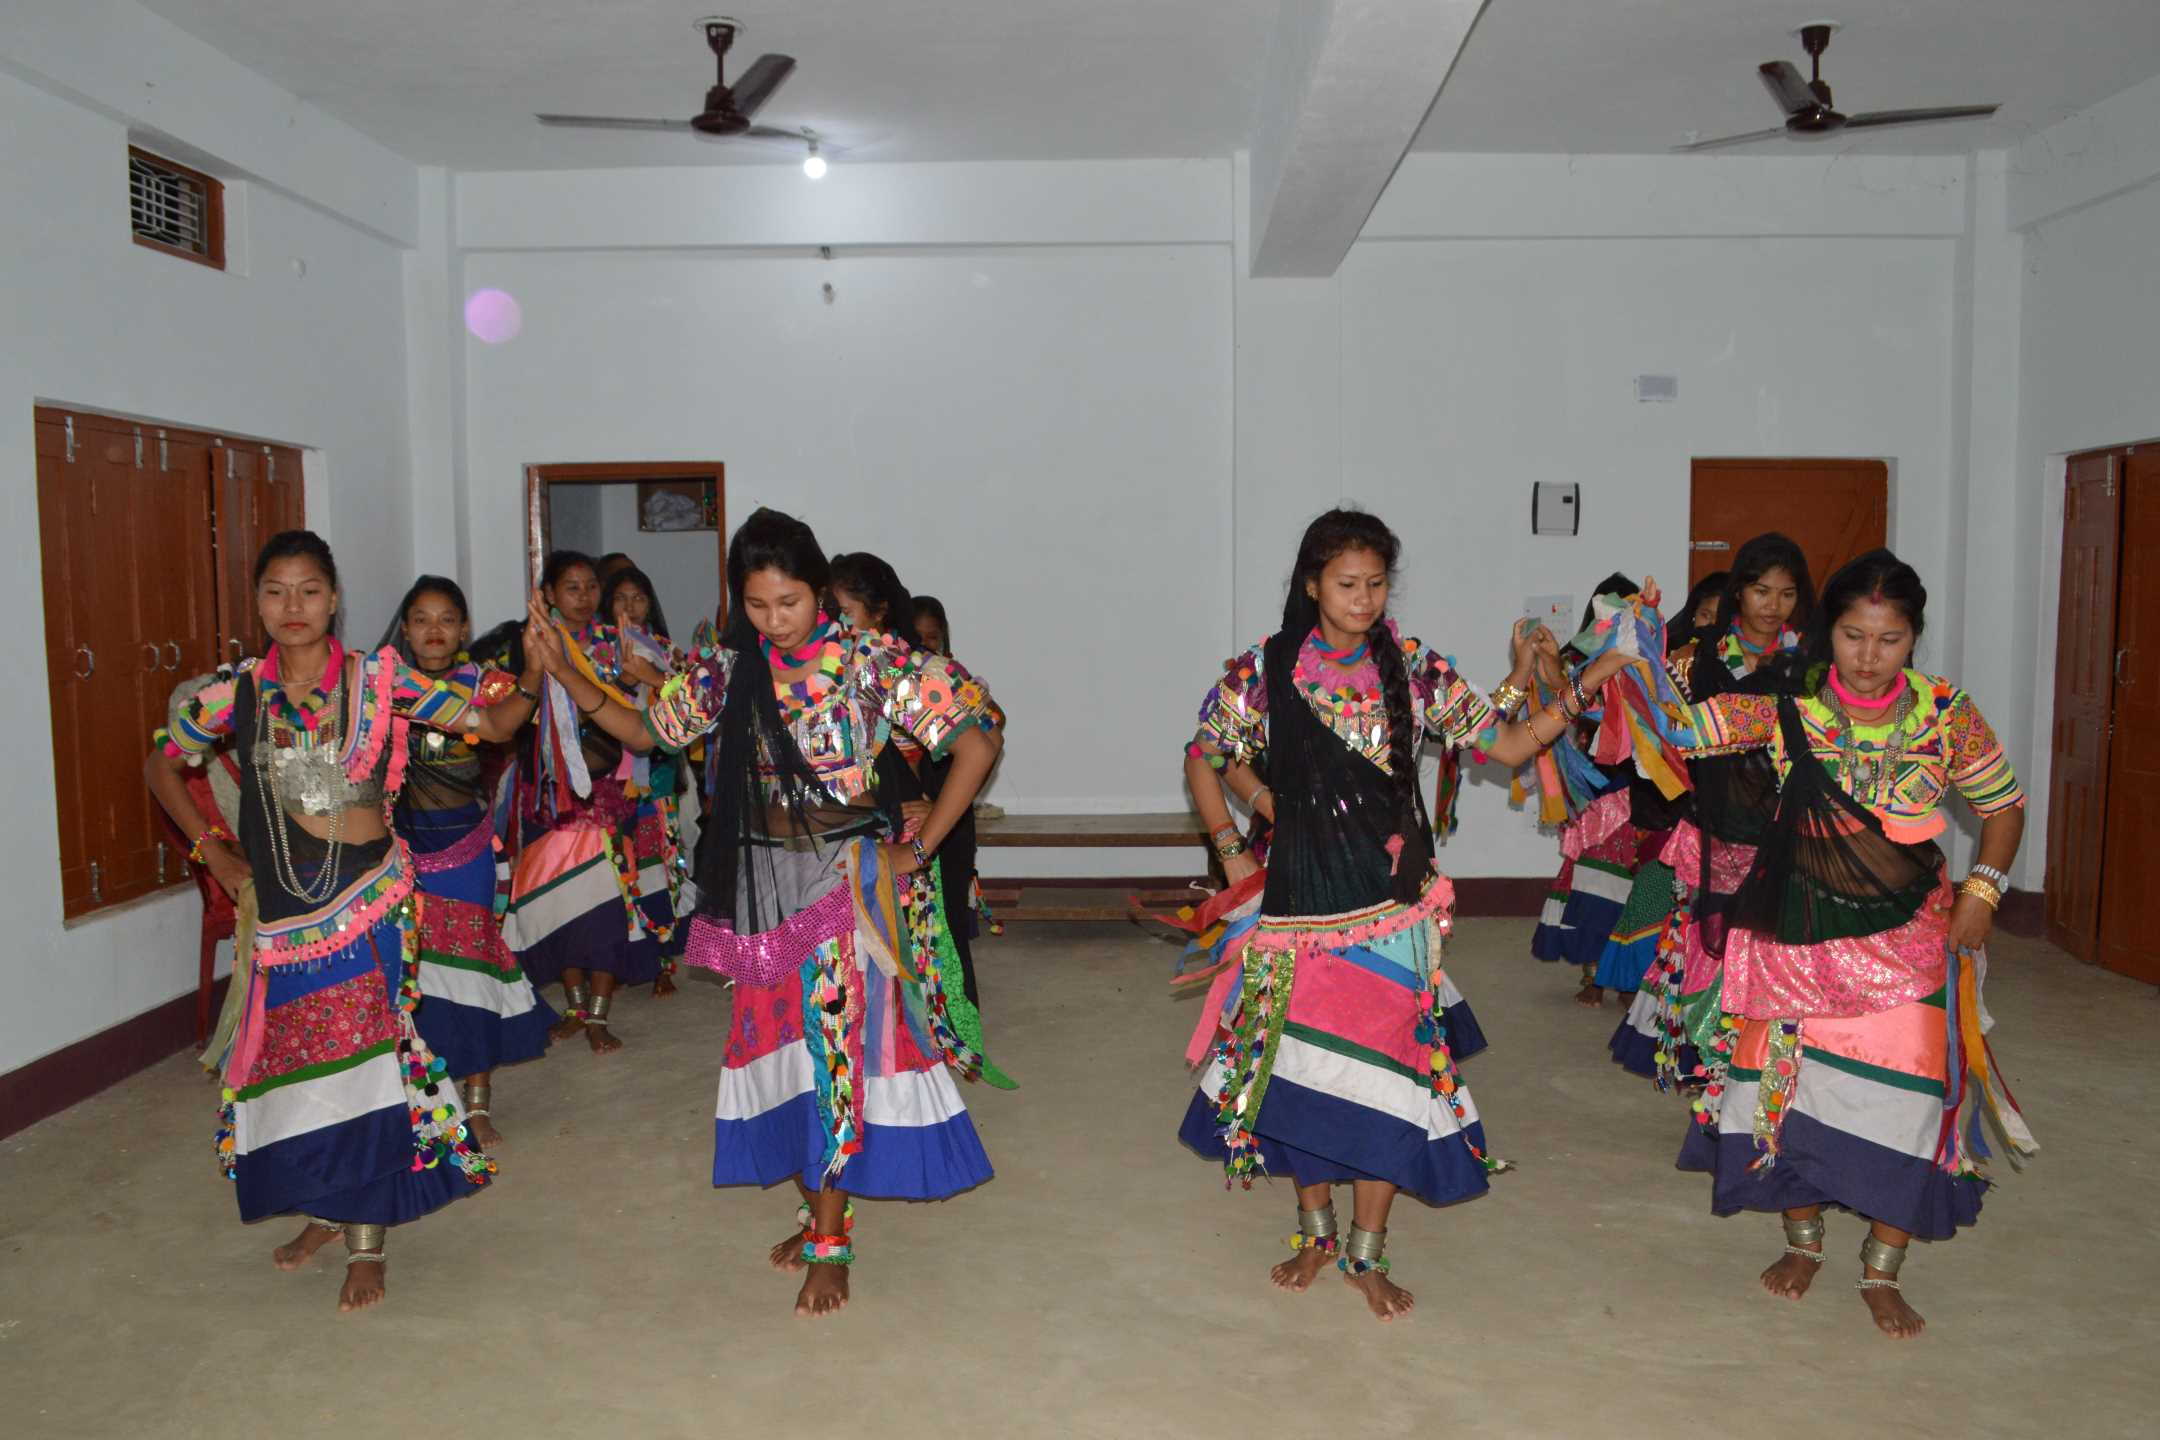 Colorful Ranu Tharu Dresses and Dance